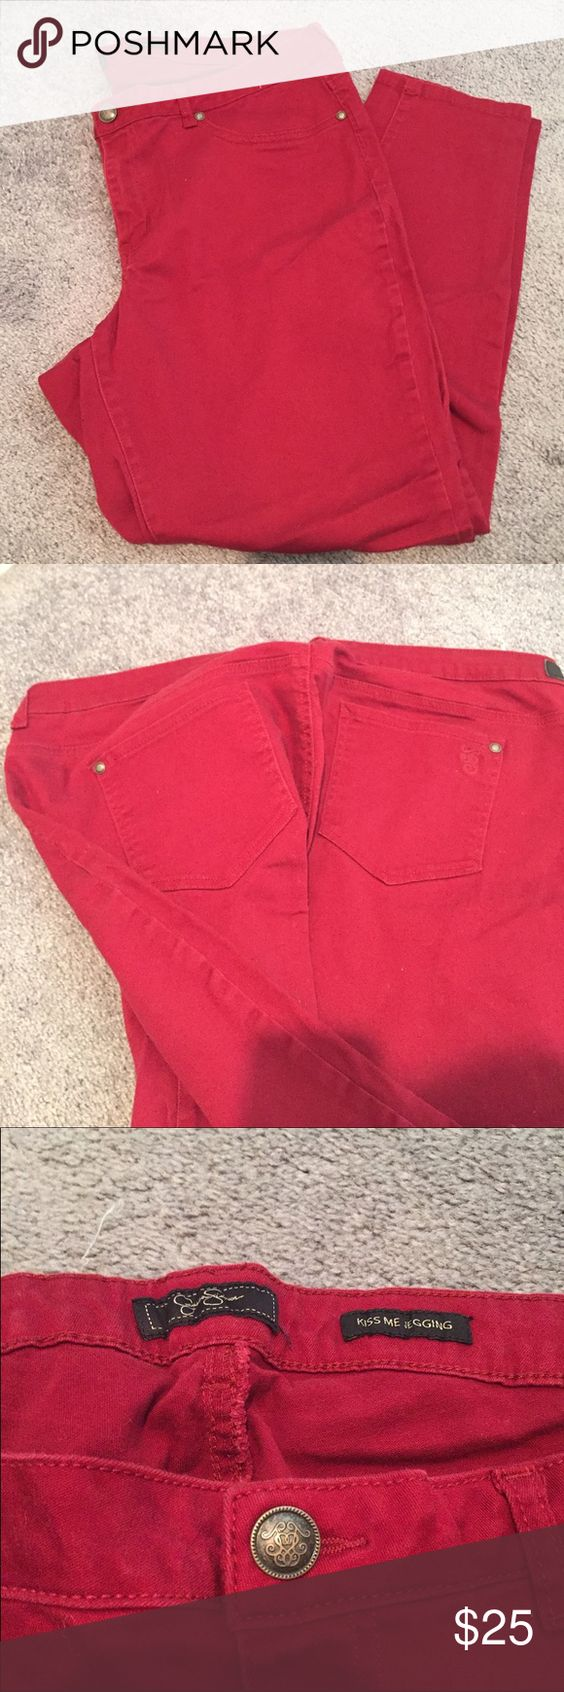 Red Jessica Simpson denim jeggins plus size 24 Gently worn. Red Jessica Simpson denim jeggins plus size 24 Jessica Simpson Jeans